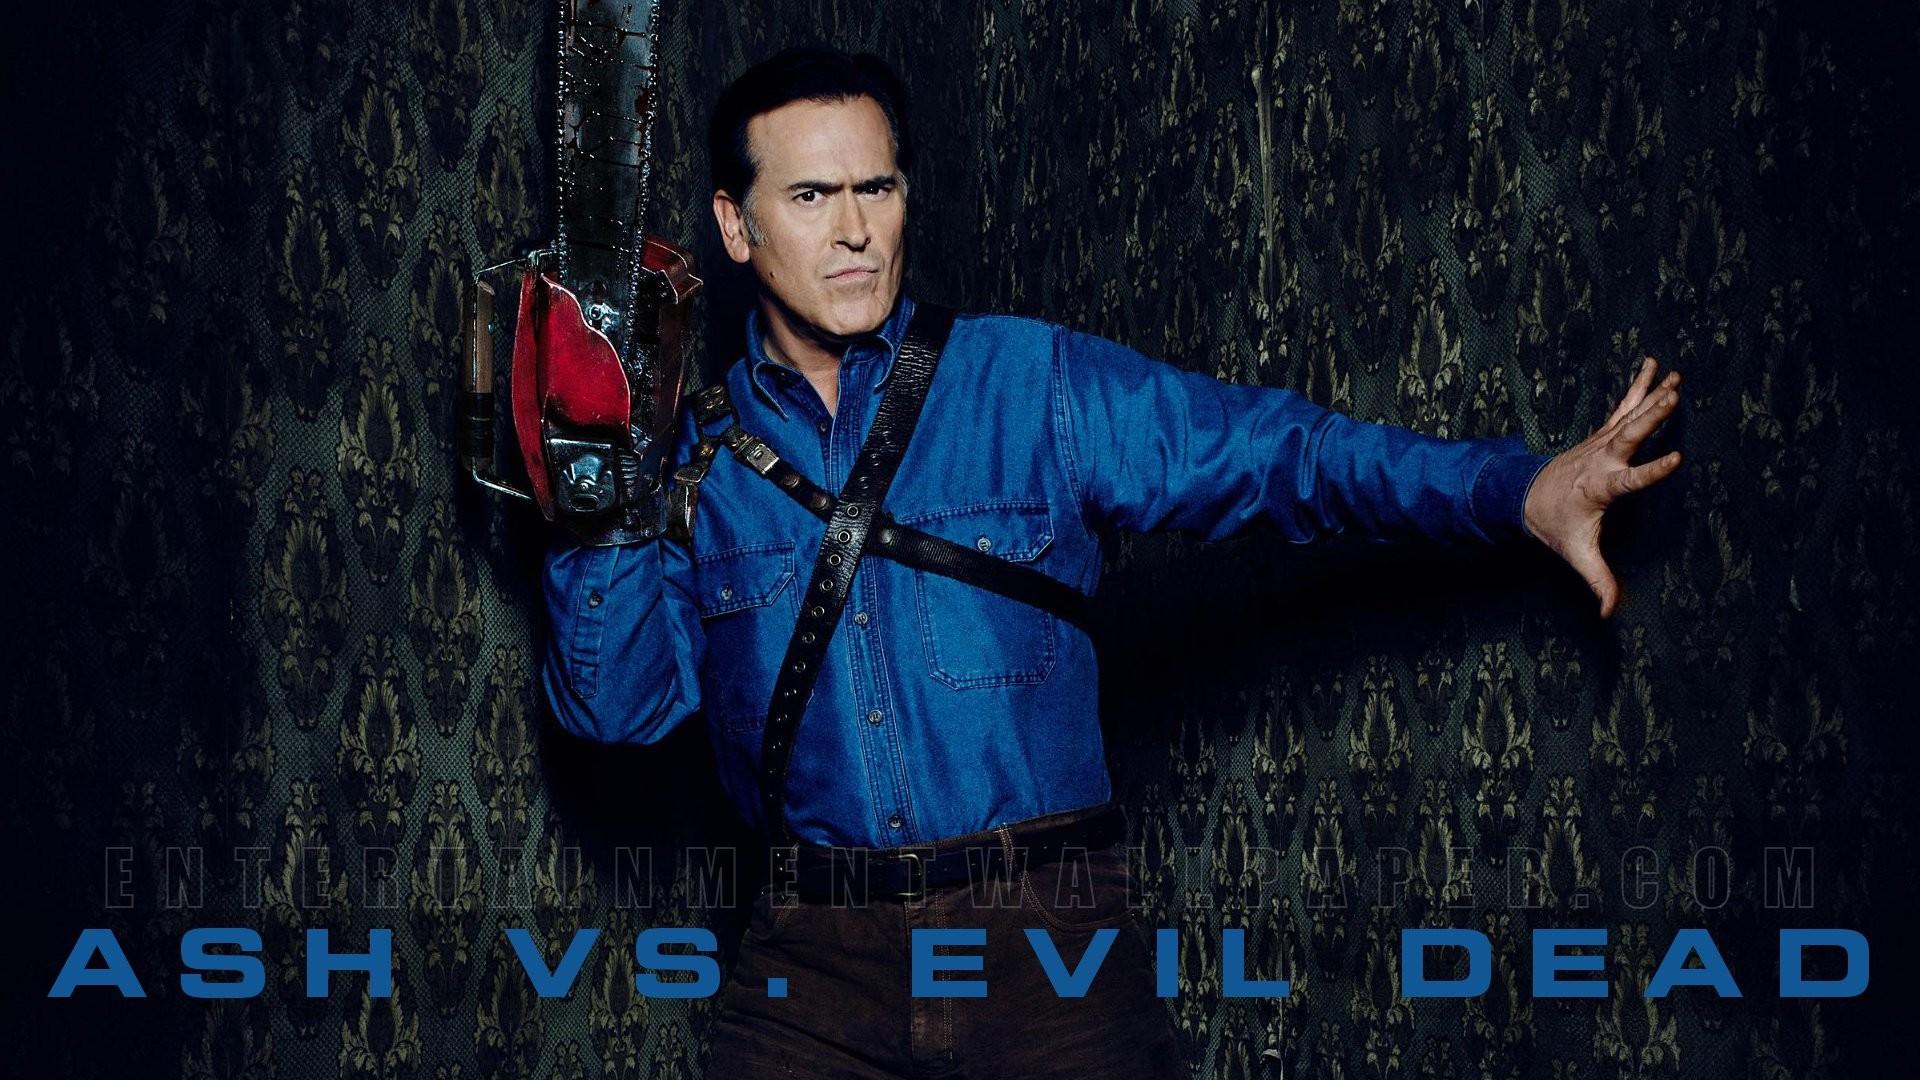 Evil Dead Wallpaper – Original size, download now.